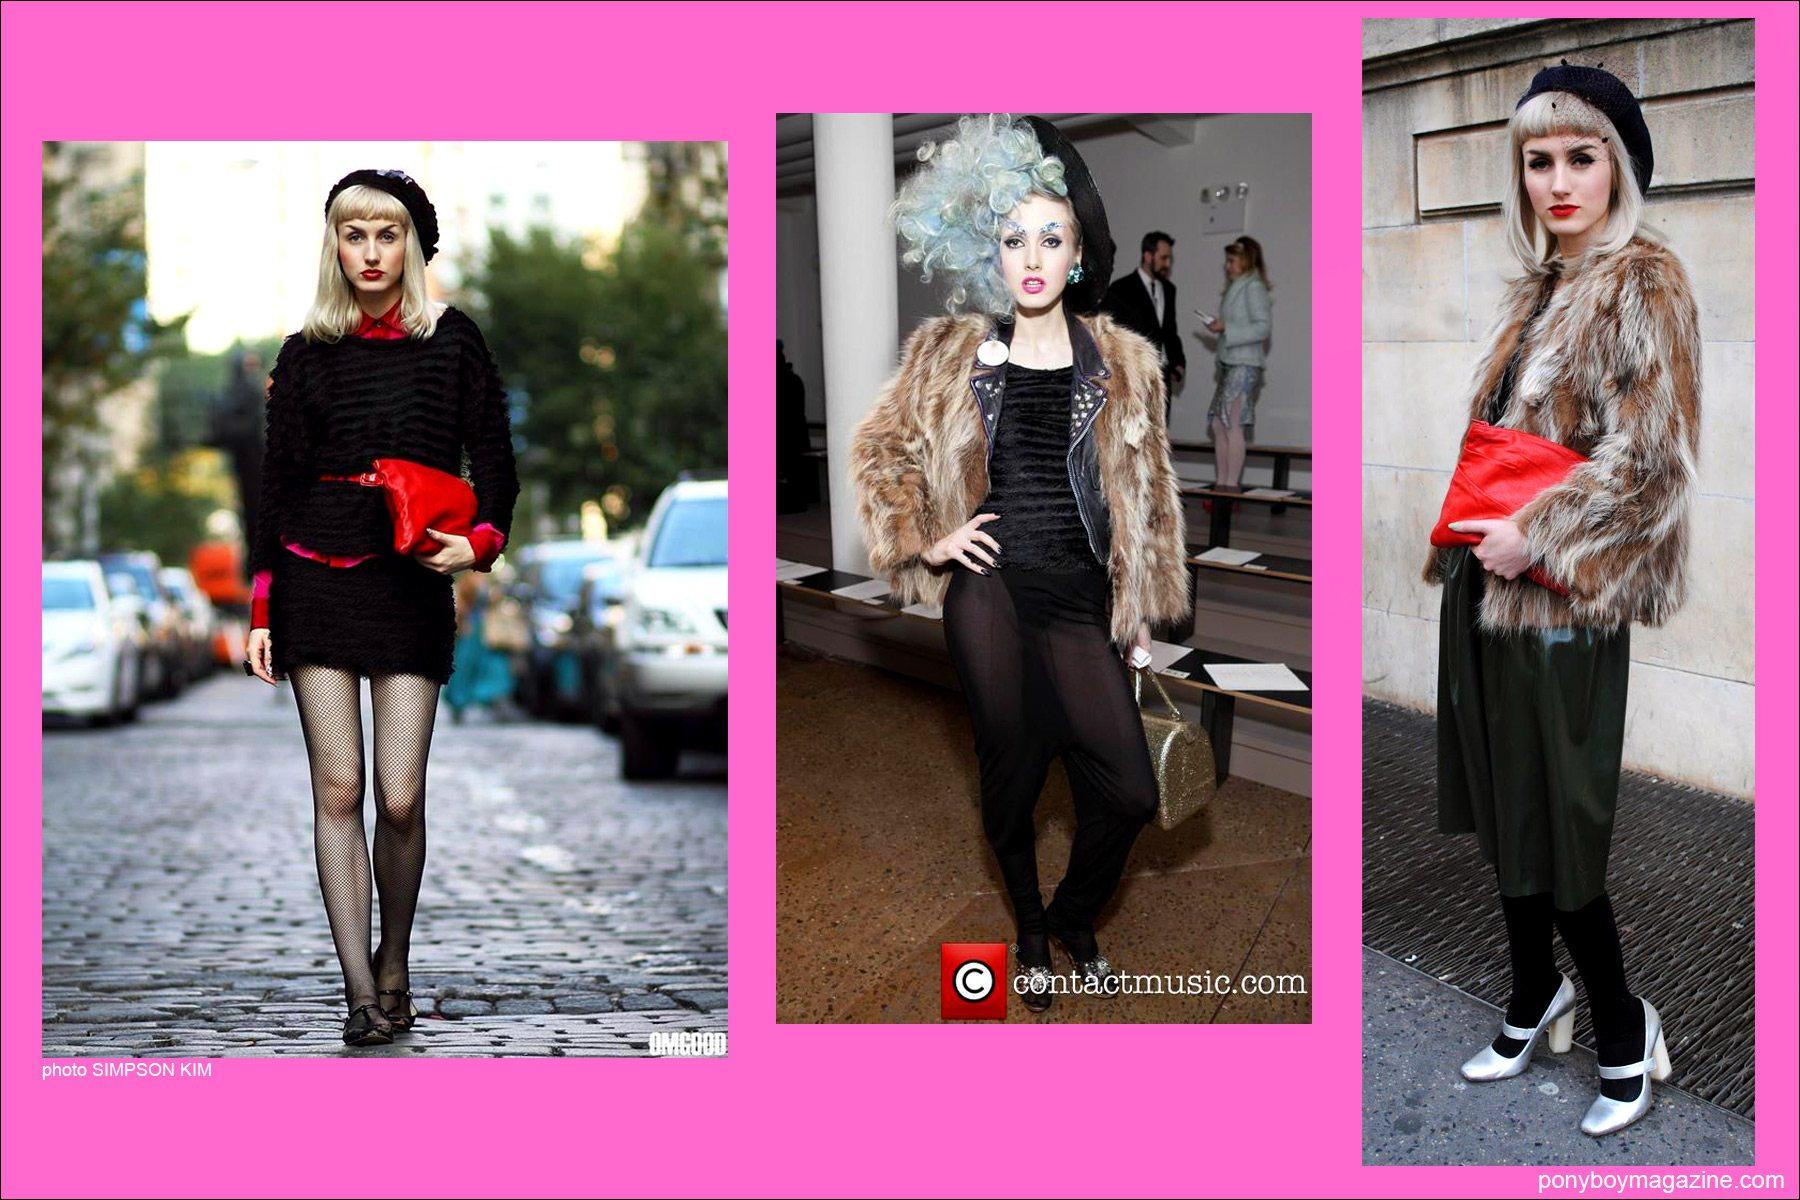 Street style shots of model/designer Stella Rose Saint Clair in New York City for Ponyboy Magazine.